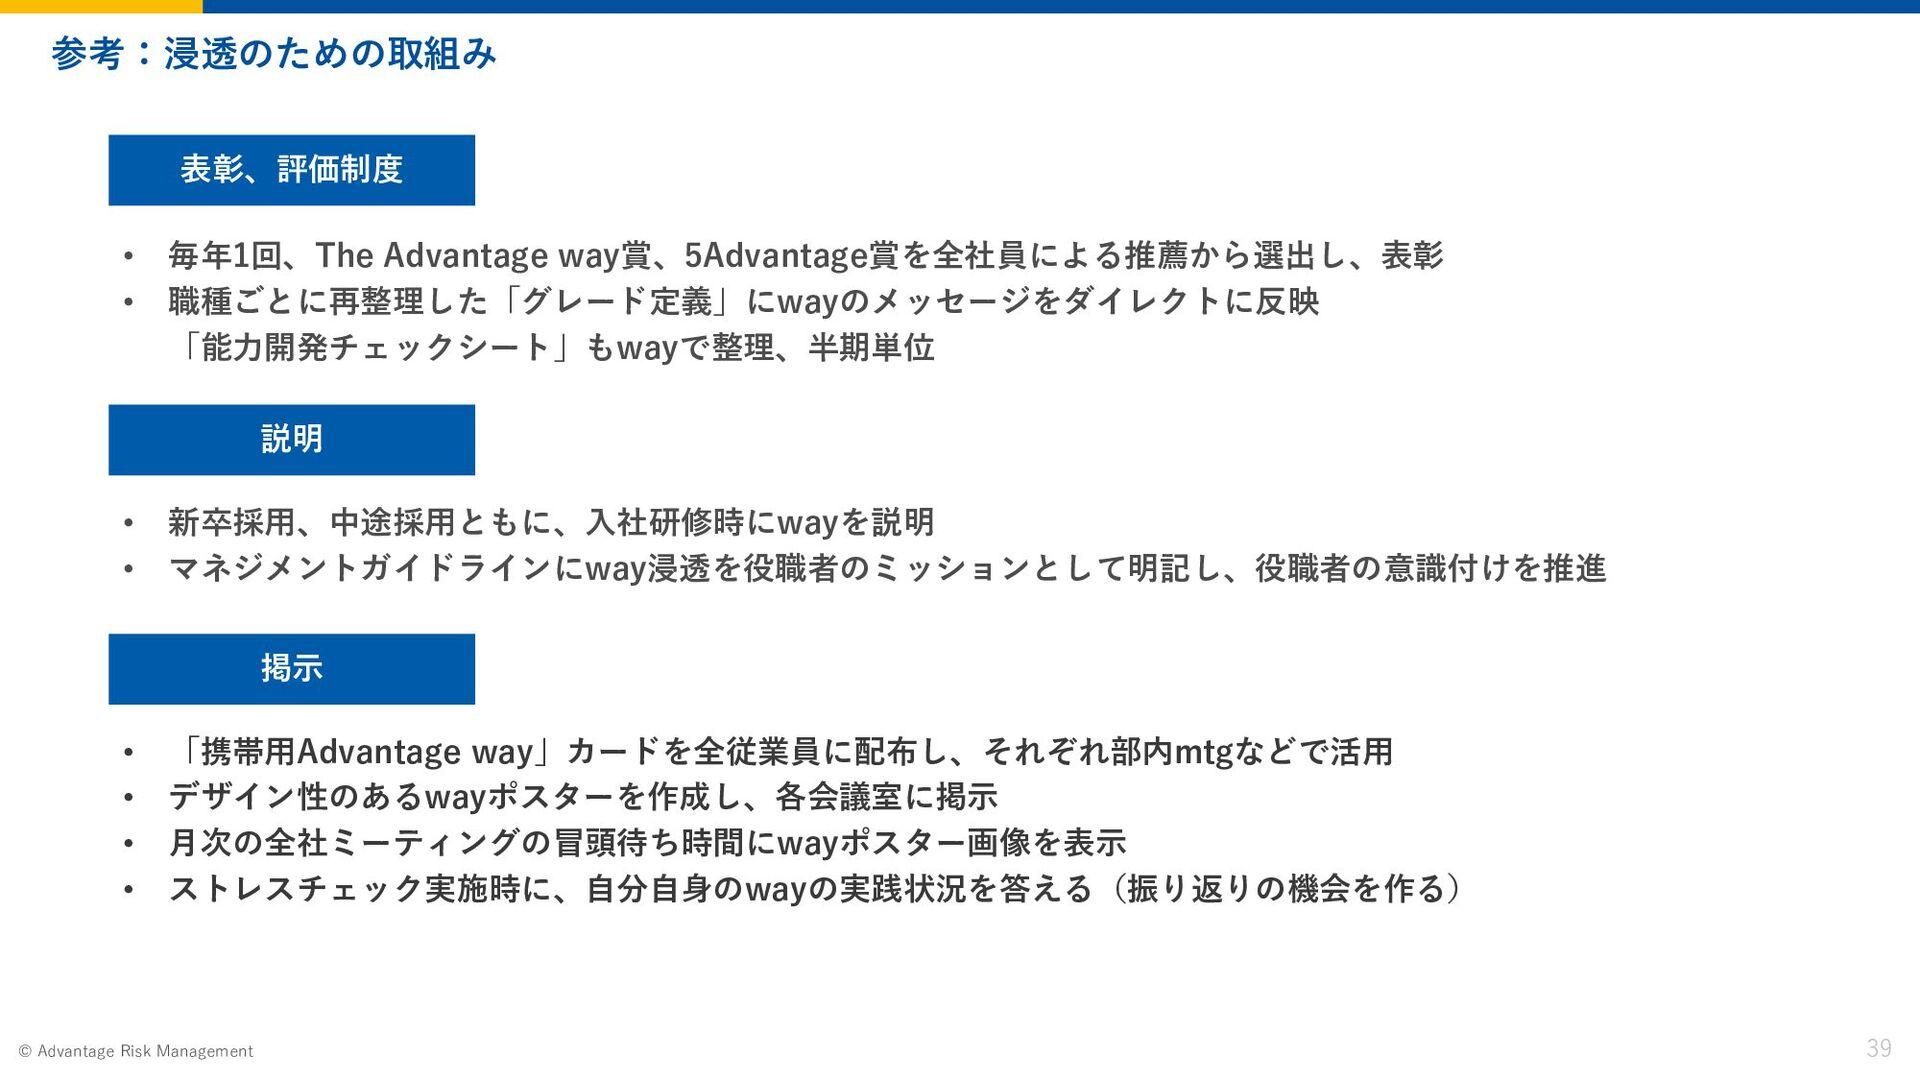 Page 39 2020 Advantage Risk Management © よくあるQ&...